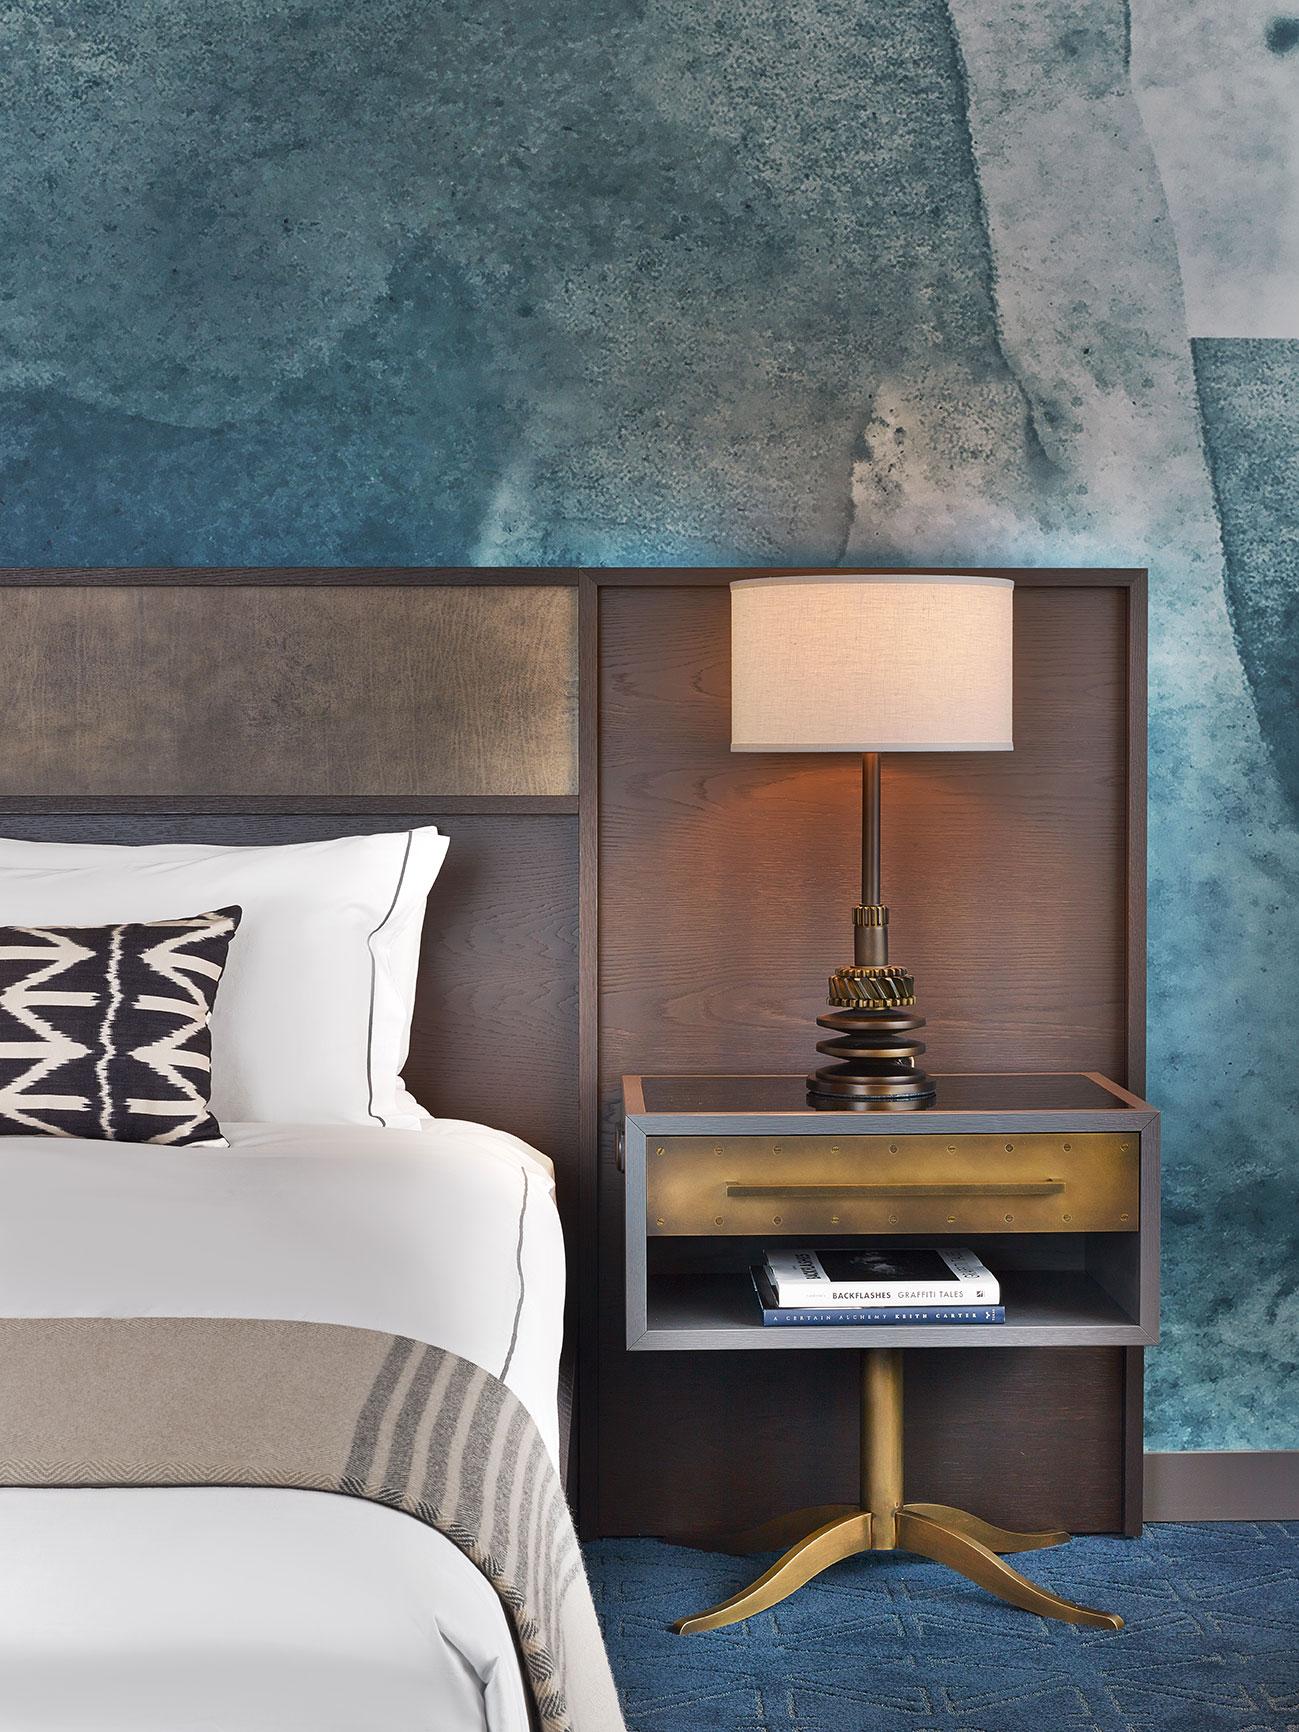 Van-Zandt-Hotel-Austin-2015-(171).jpg